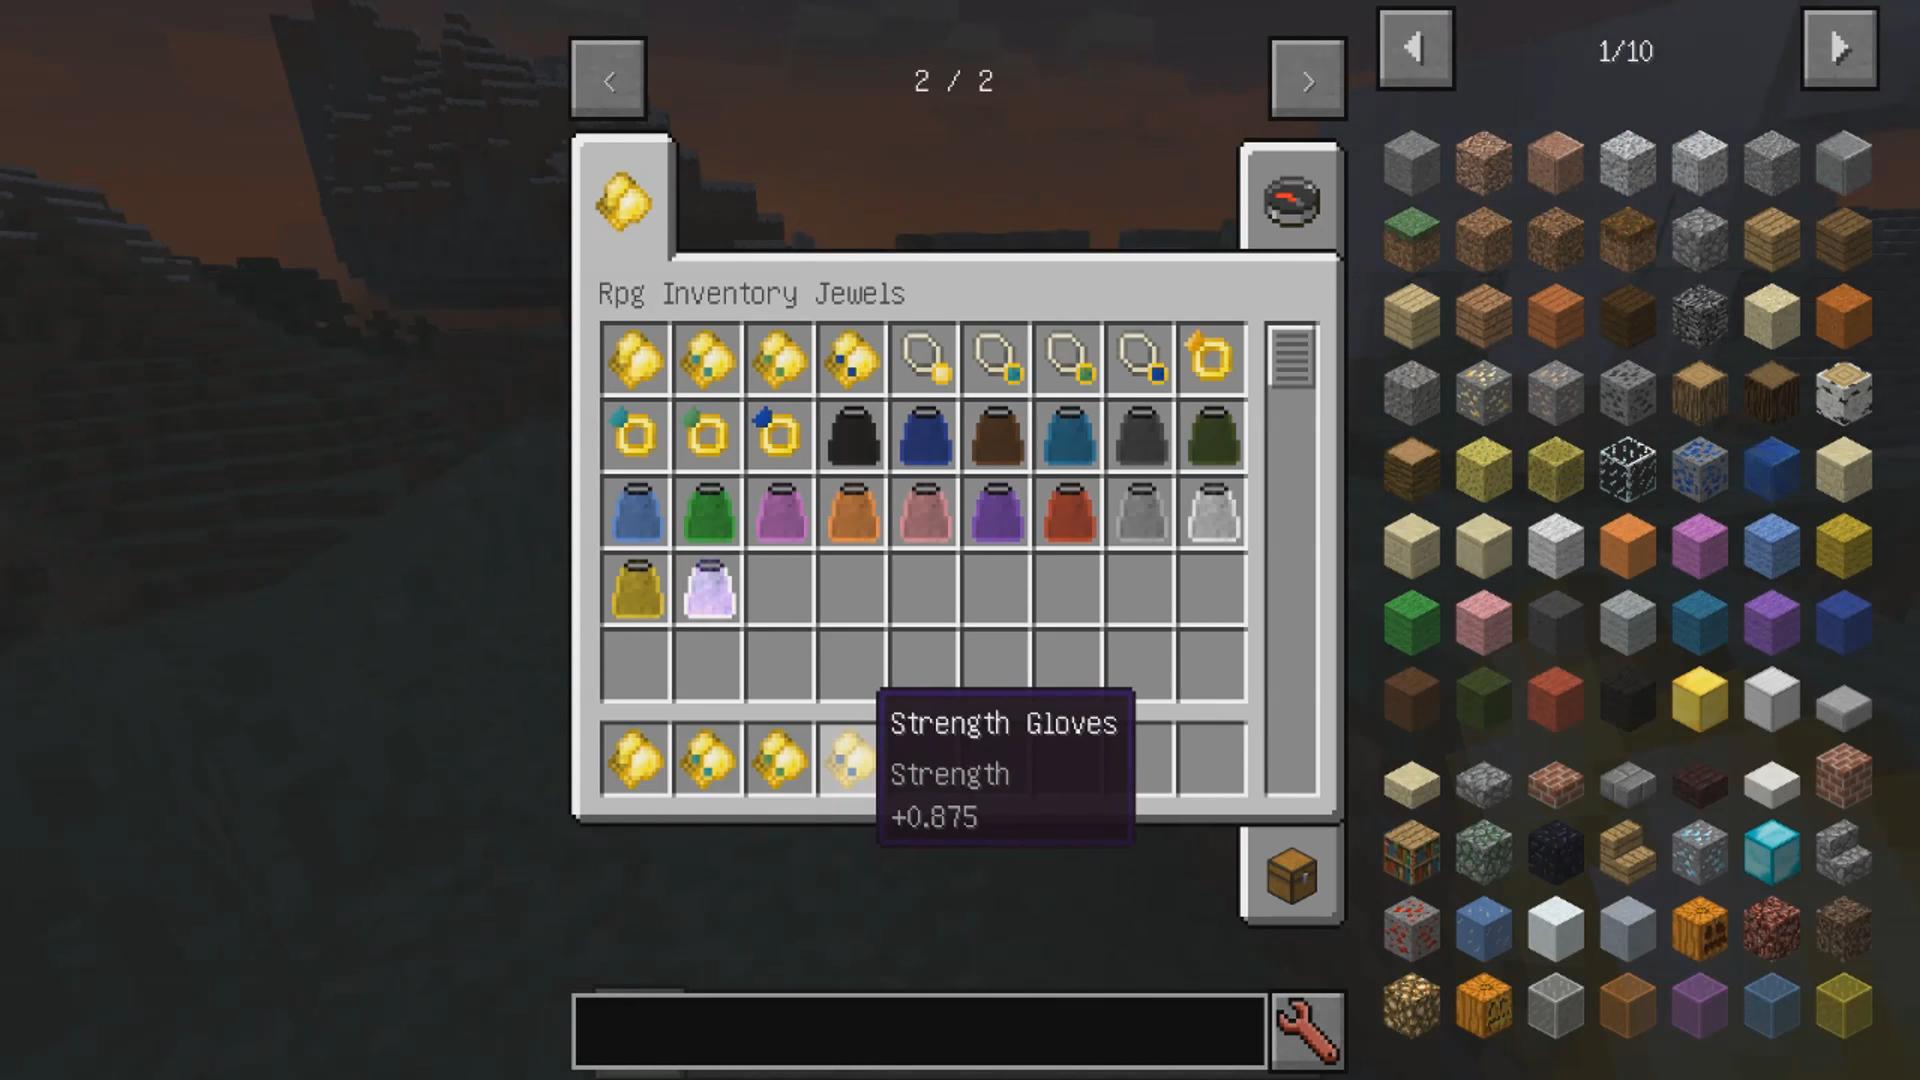 Мод «Rpg Inventory» (Прокачка игрока) - скриншот 3